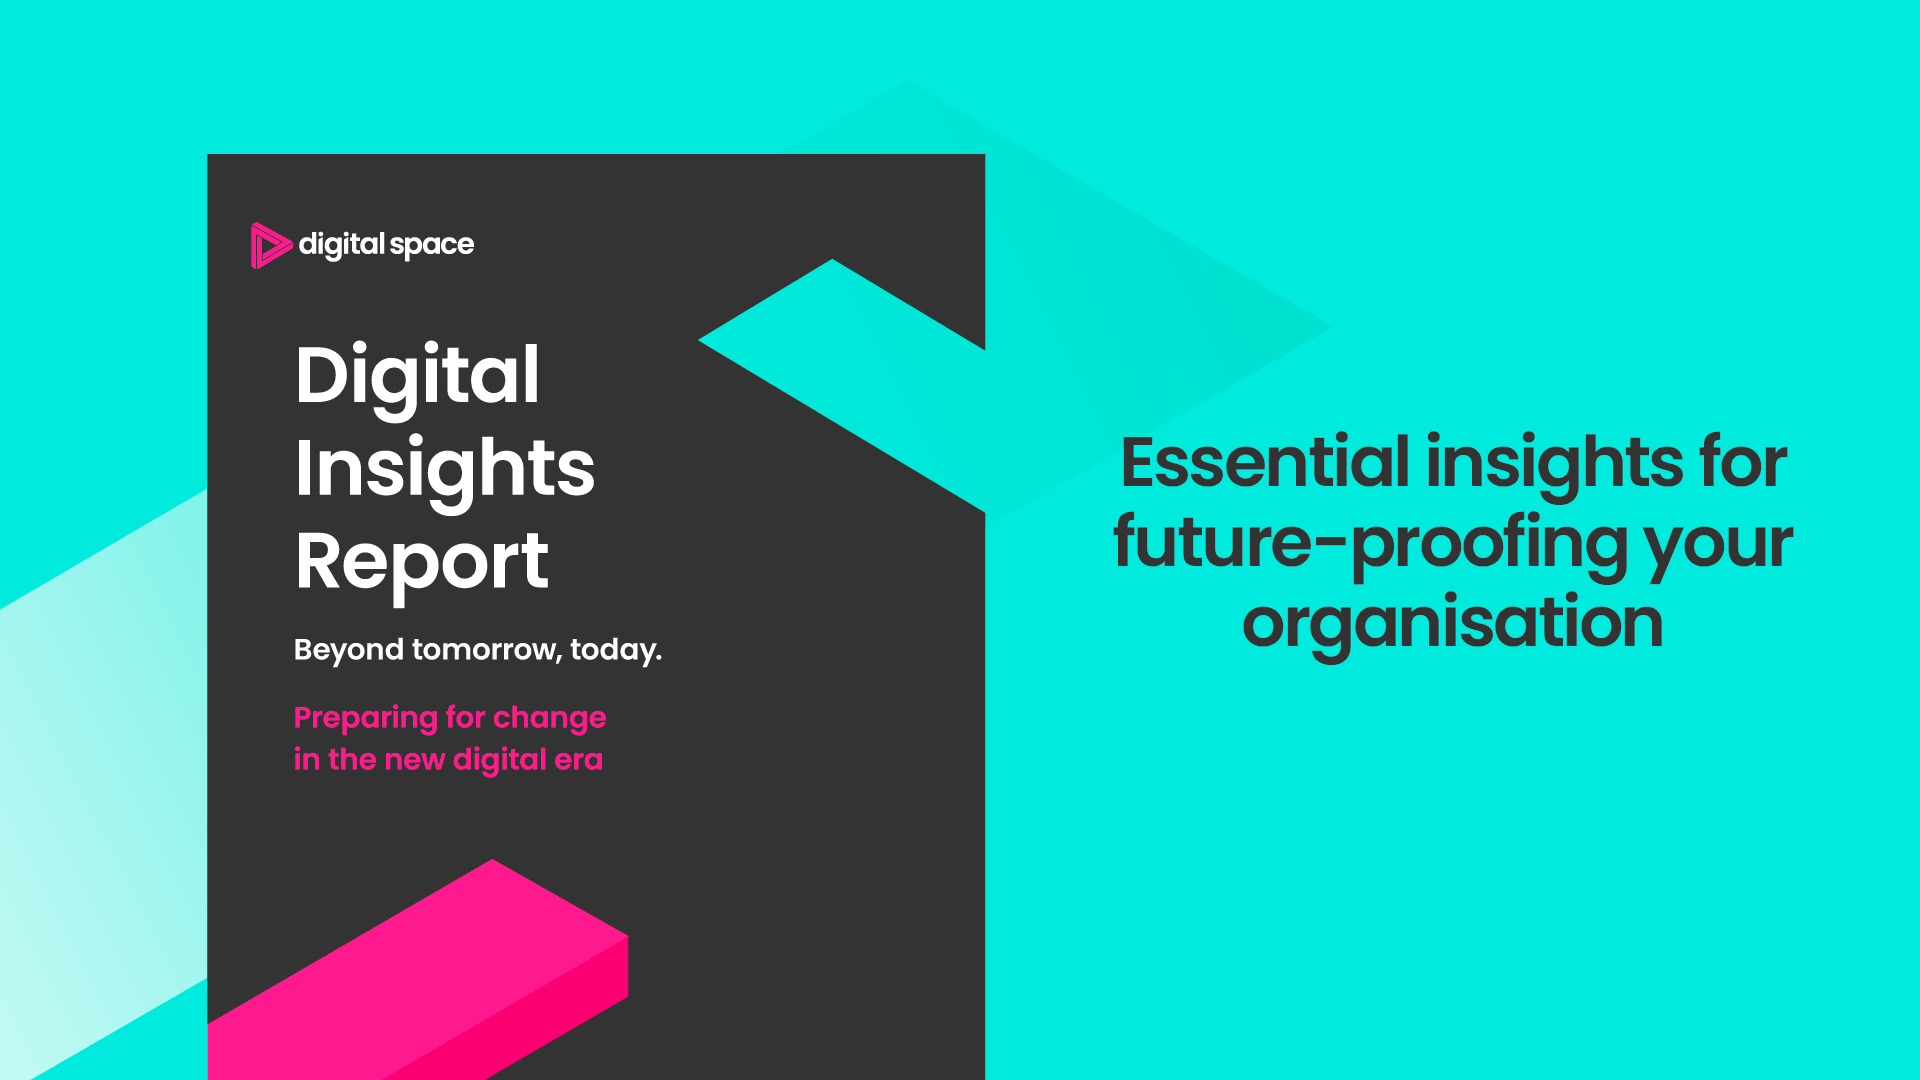 digital insights report